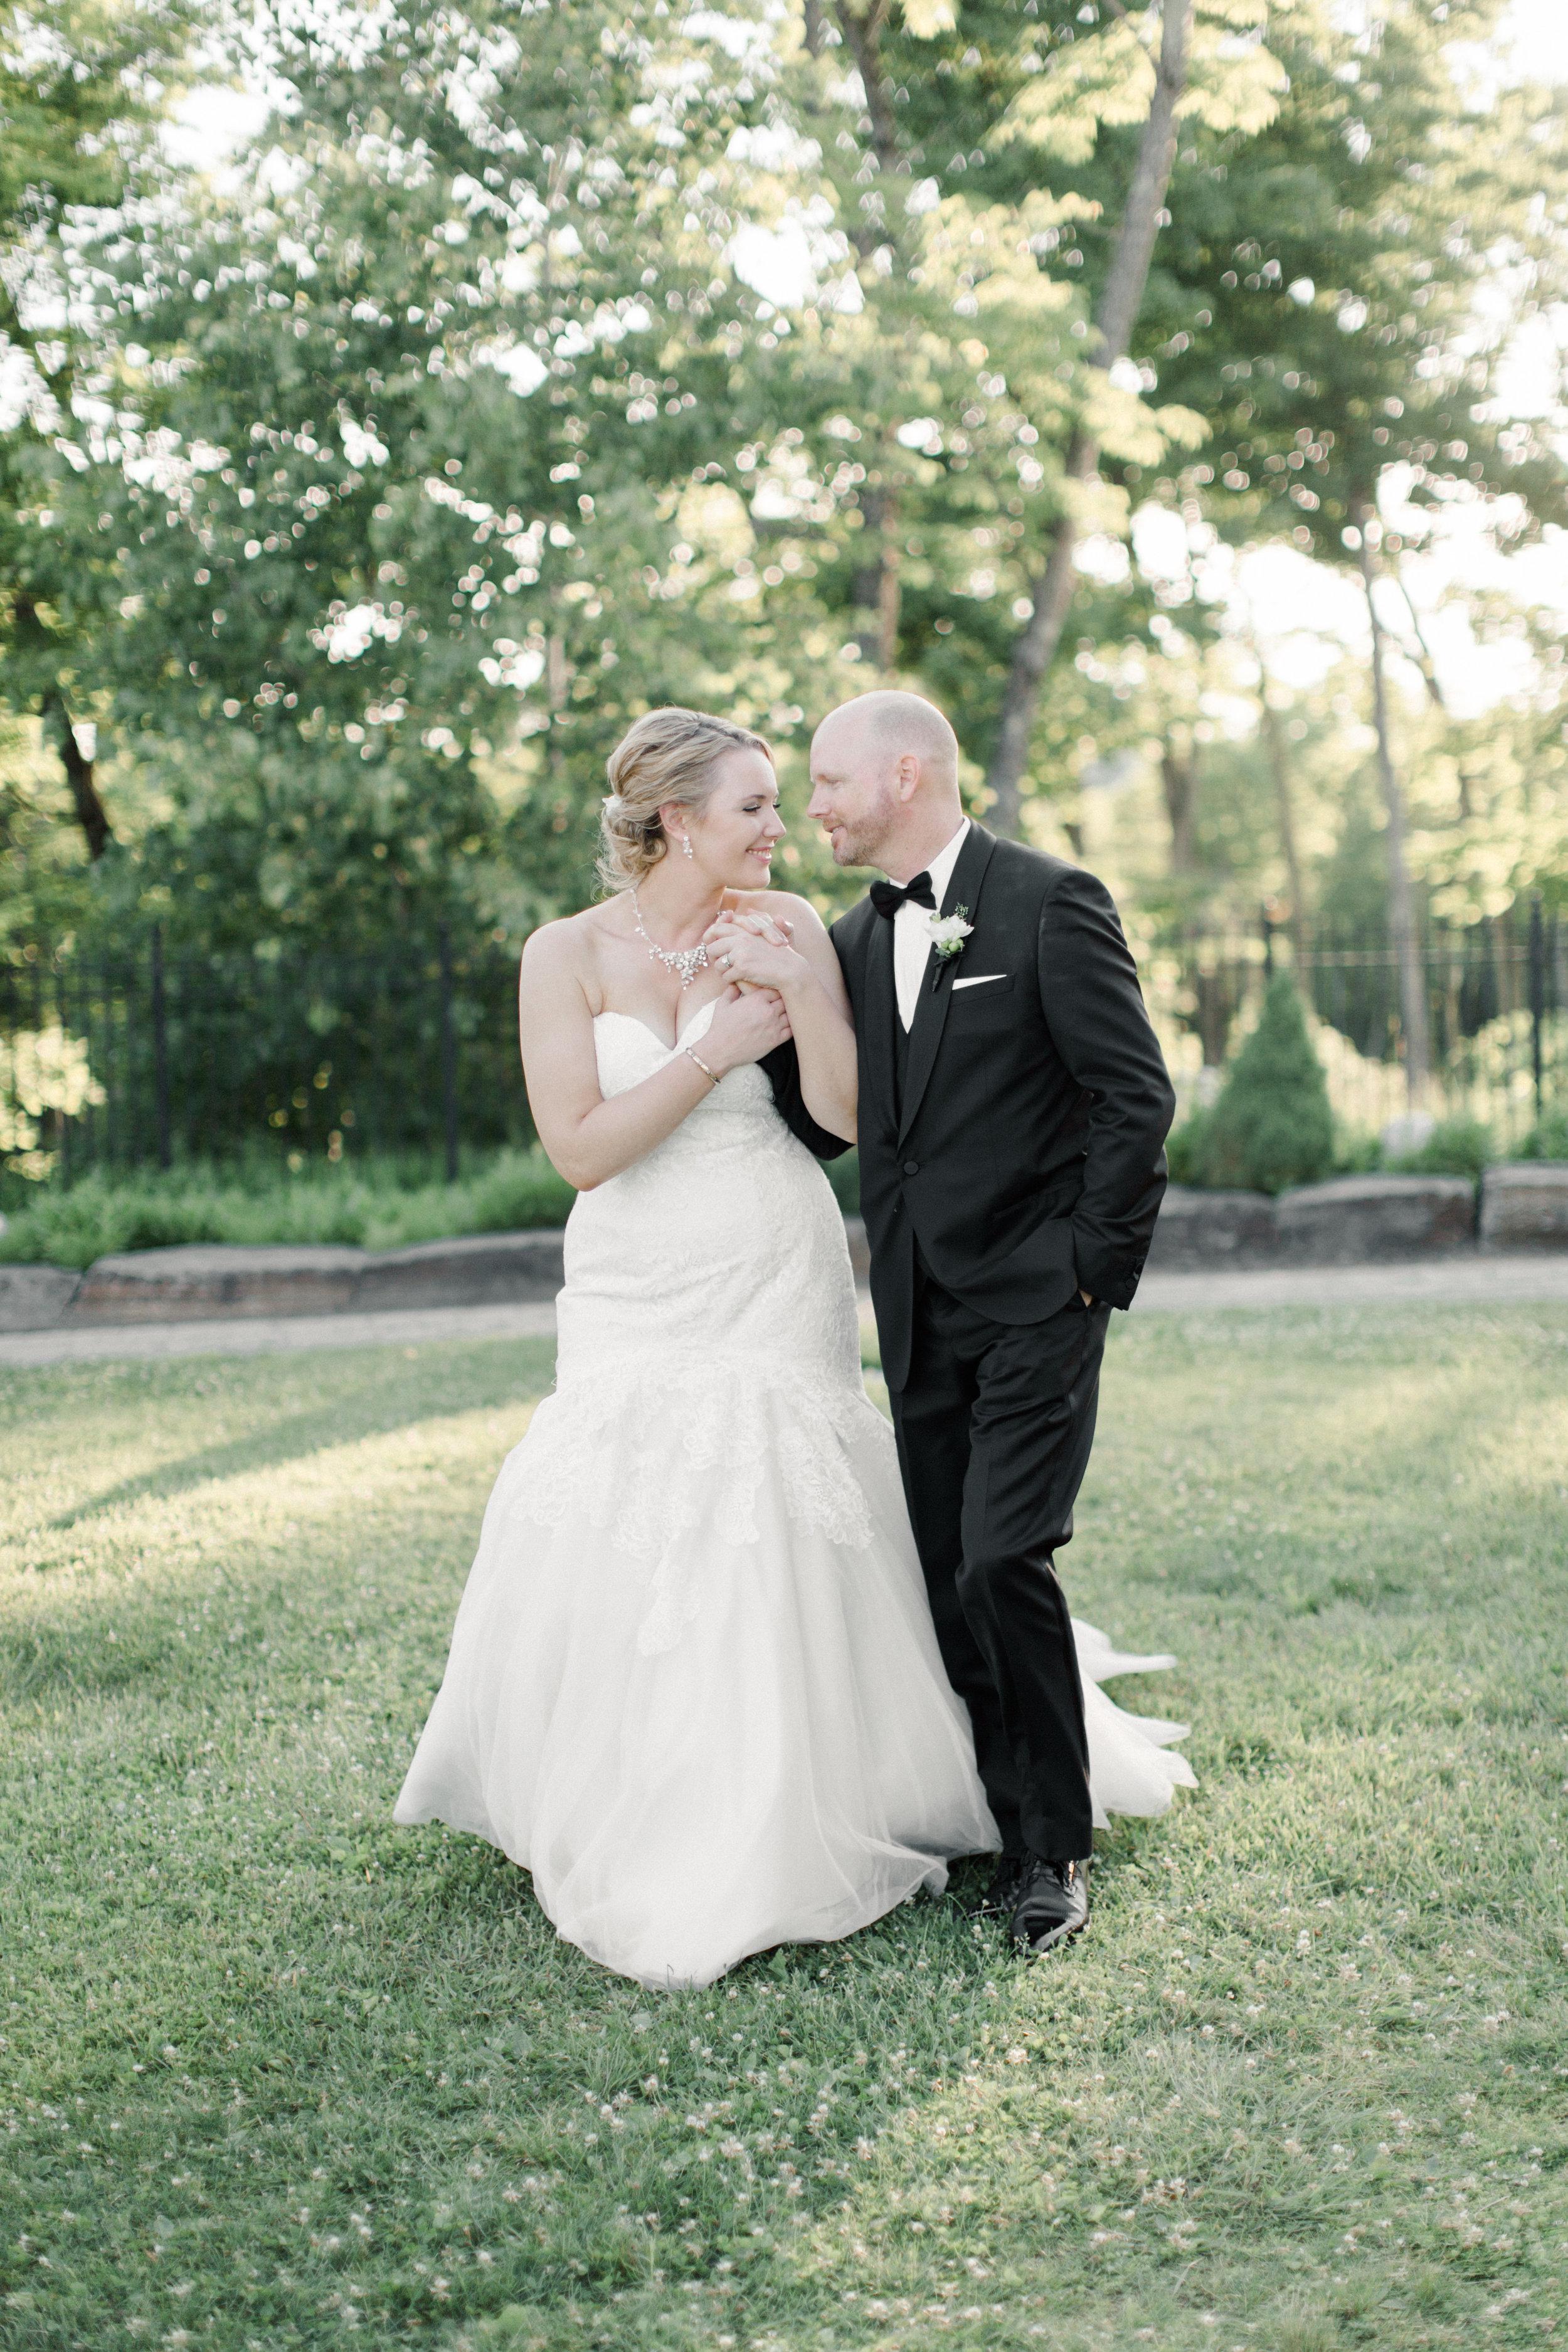 toronto-ontario-muskoka-rosseau-marriott-high-end-wedding-photographer-richelle-hunter-tori-doug-689.jpg